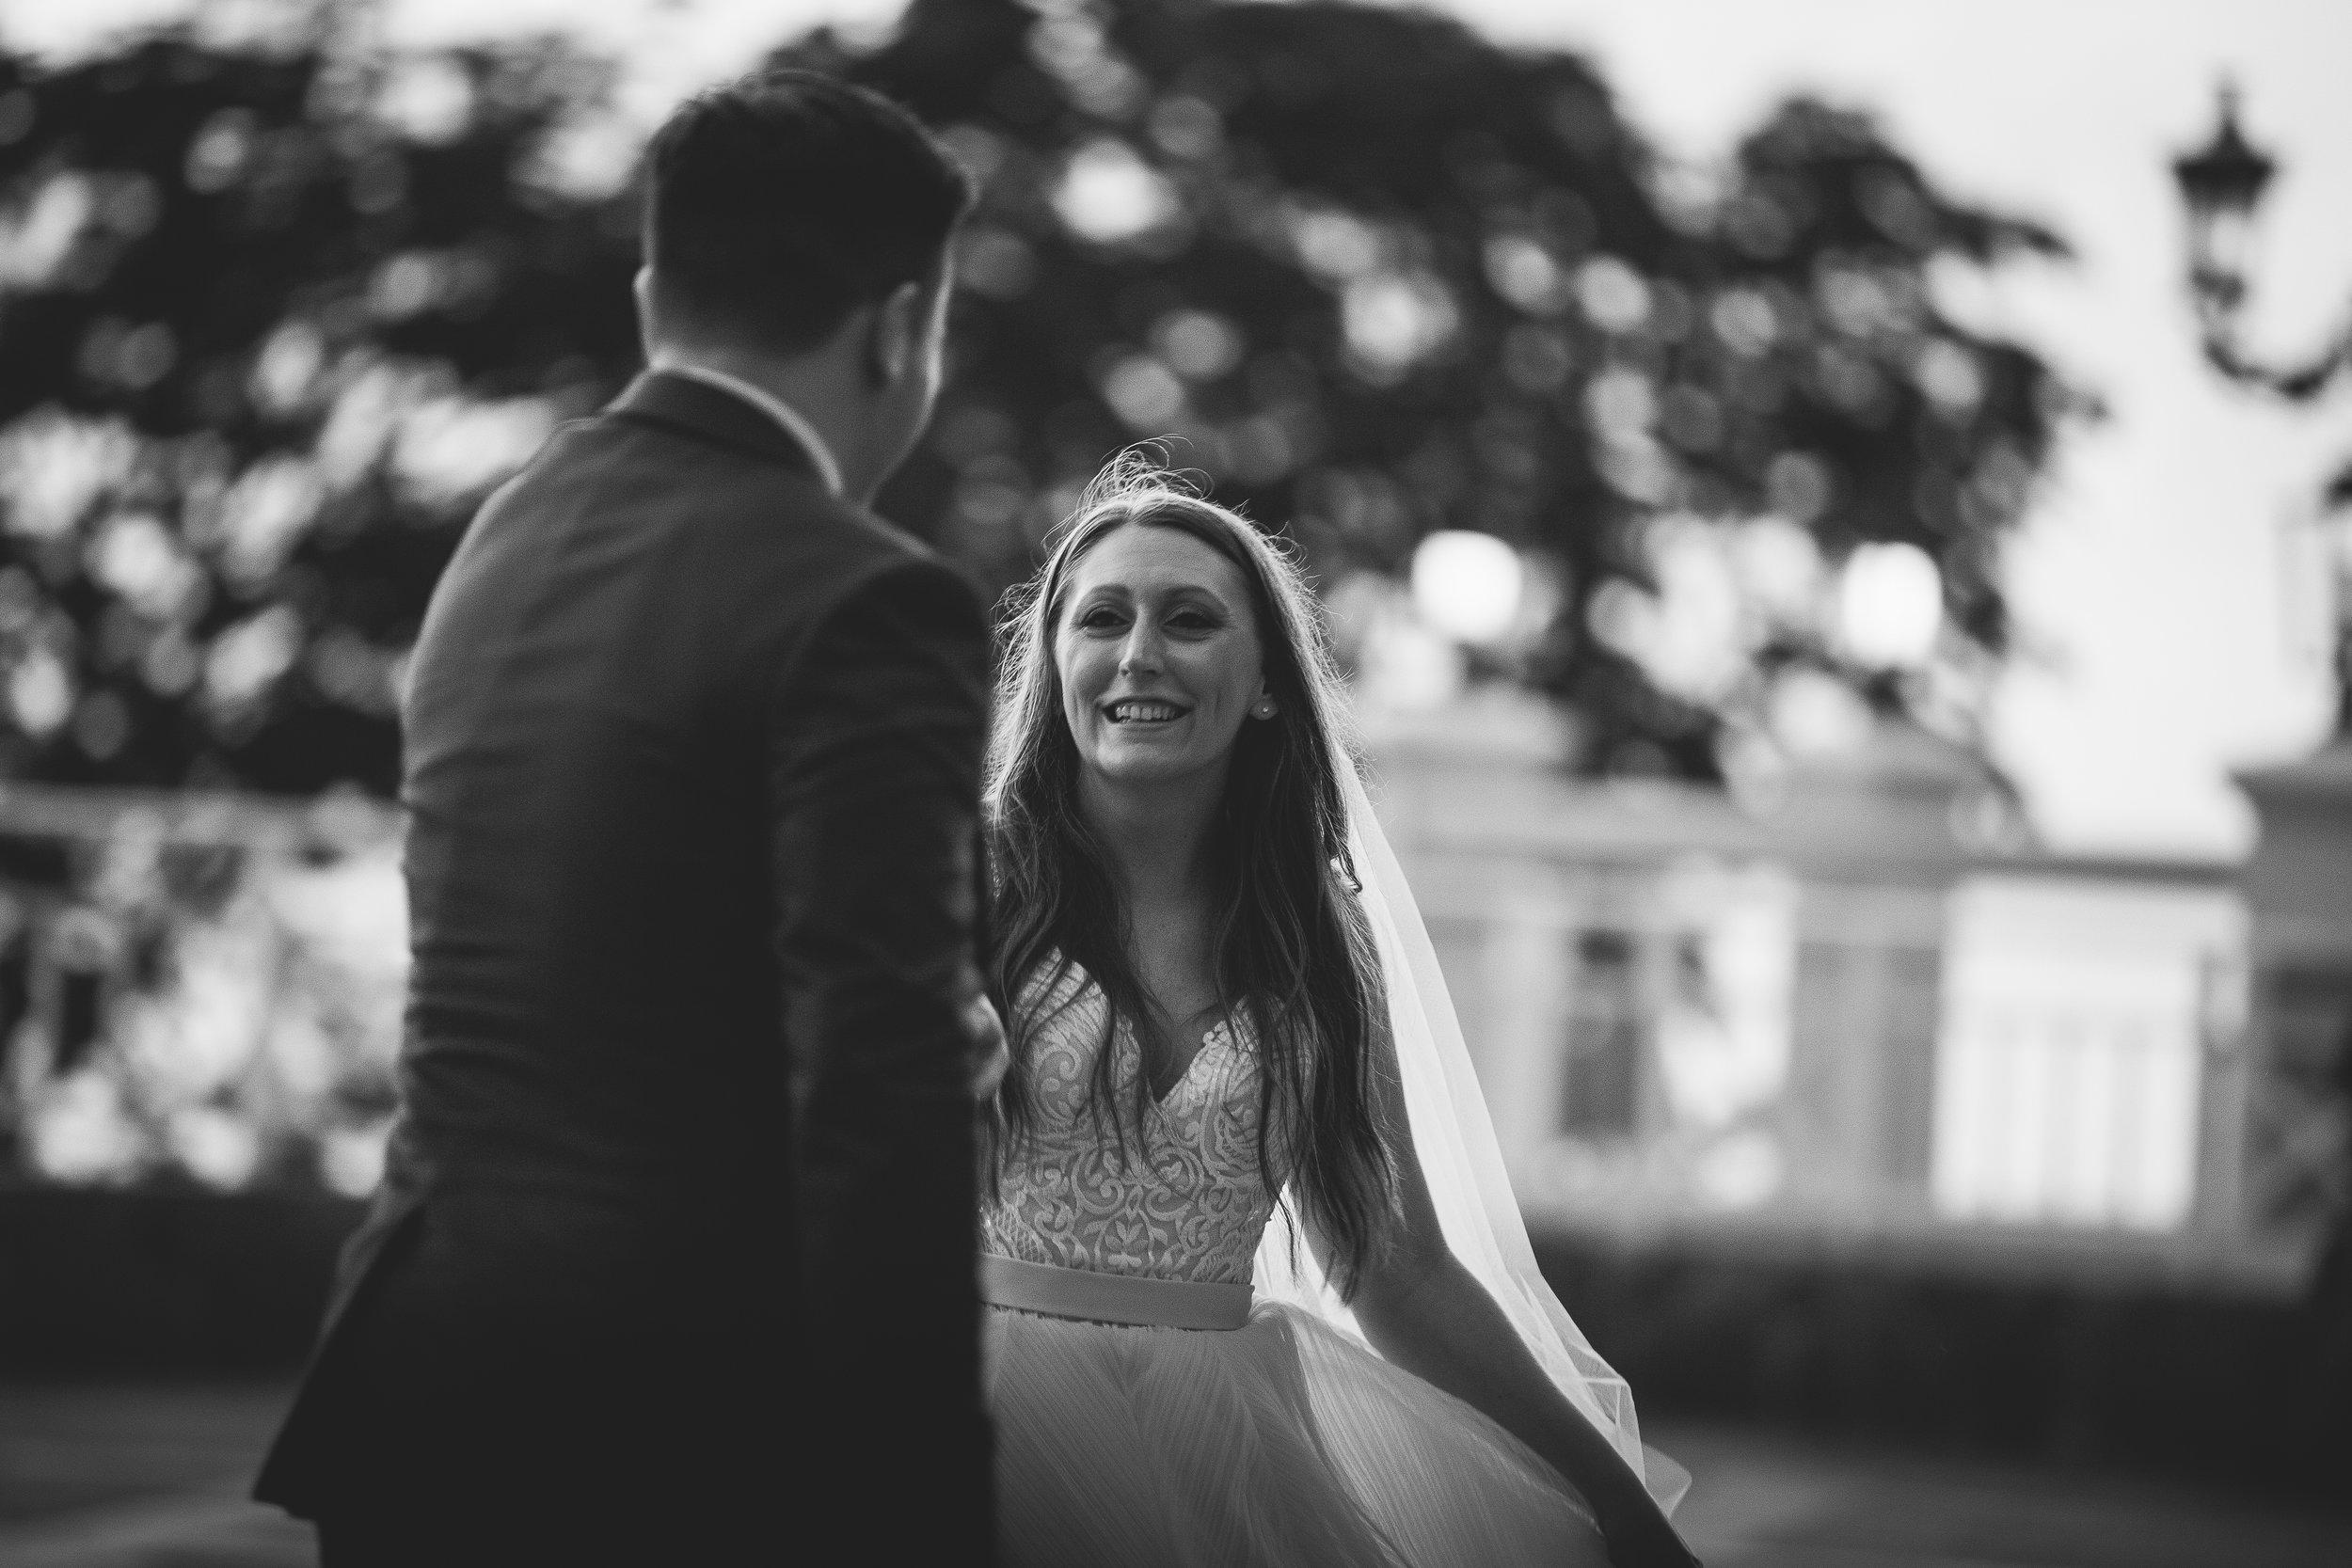 nicole-daacke-photography-destination-wedding-in-st-lucia-sandals-la-toc-intimate-island-wedding-carribean-elopement-photographer-chill-island-wedding-134.jpg